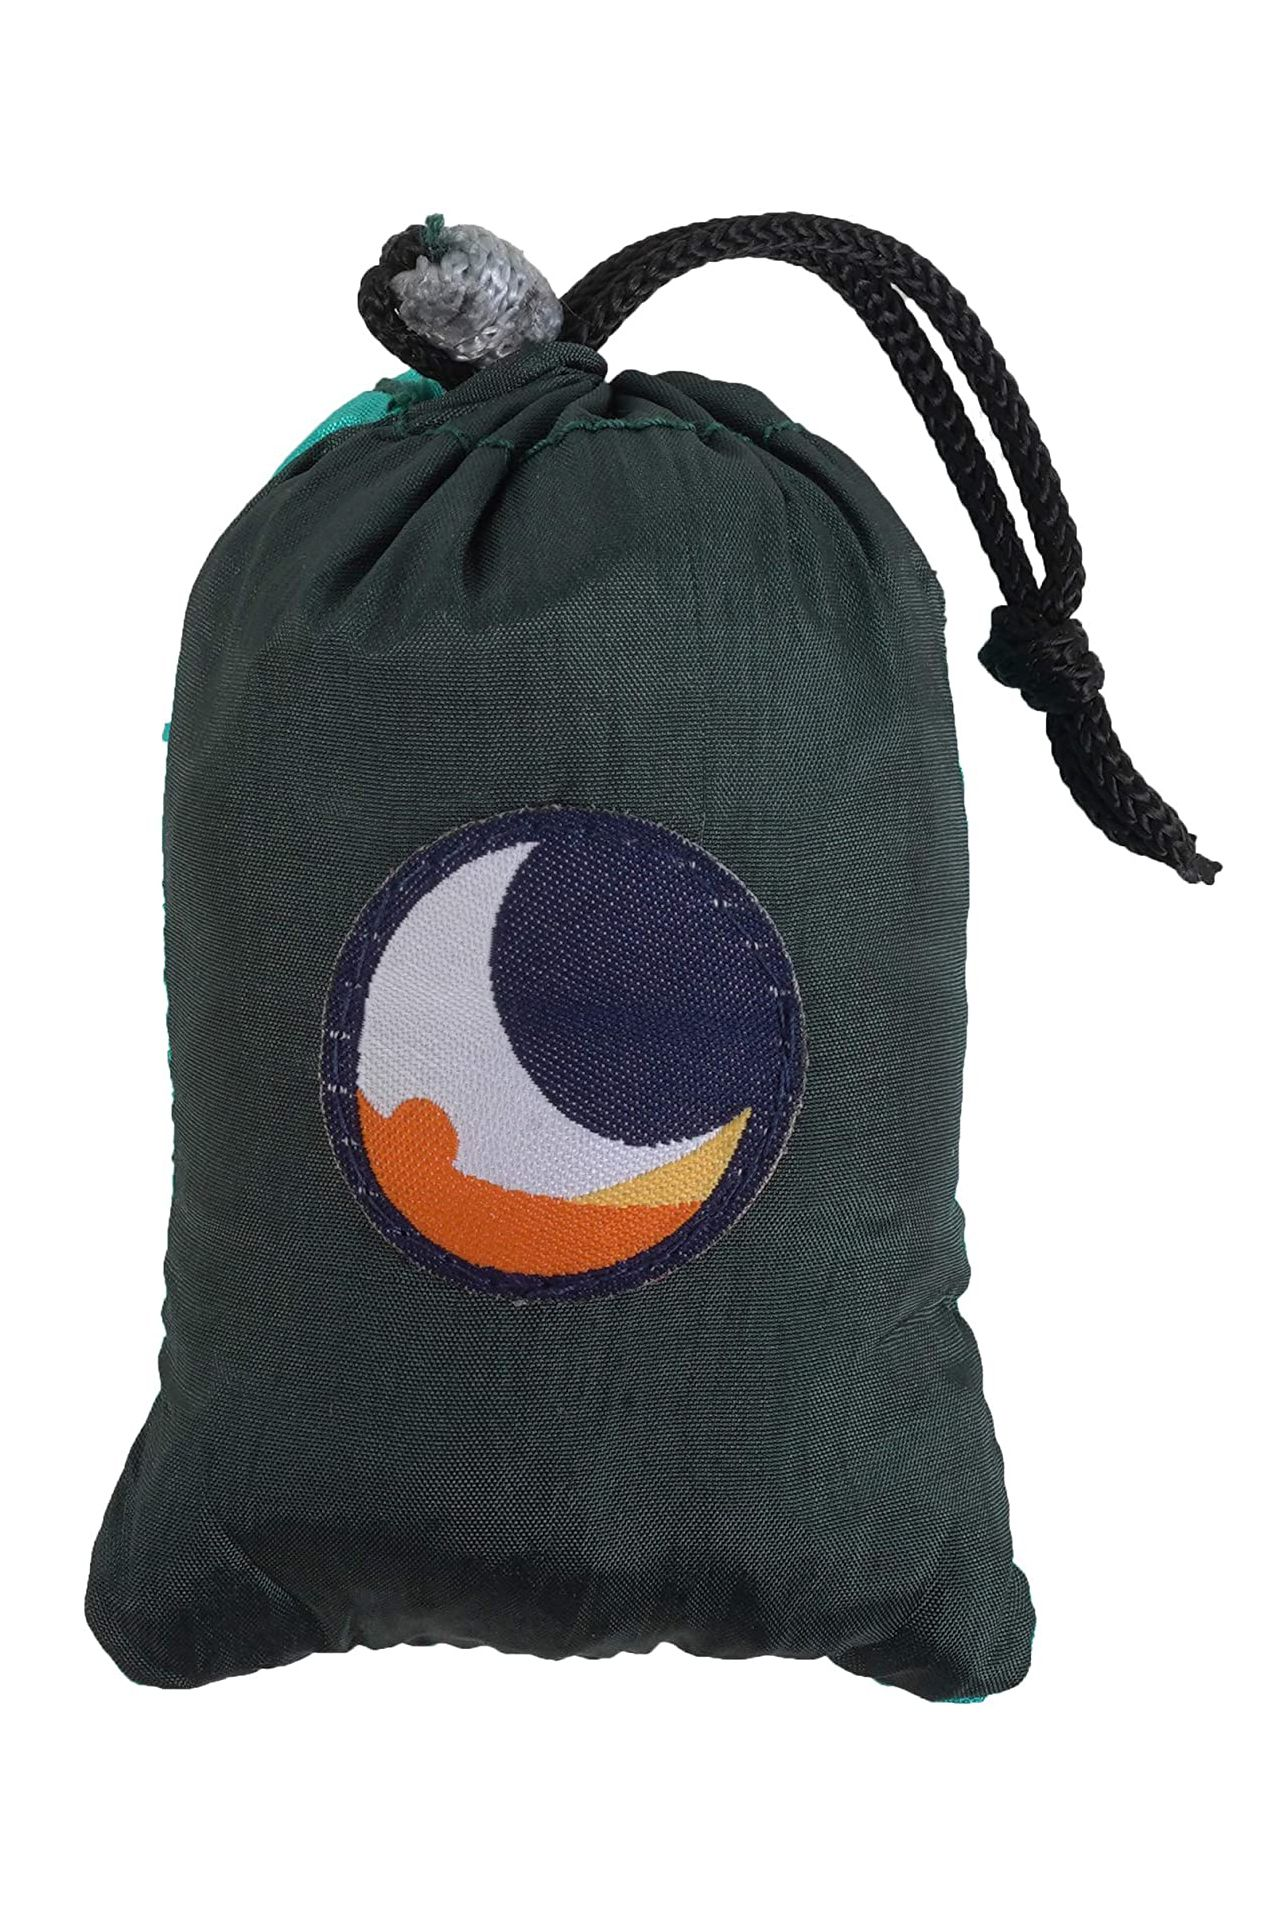 Saco Ticket To The Moon ECO BAG MEDIUM Dark Green/Turquoise